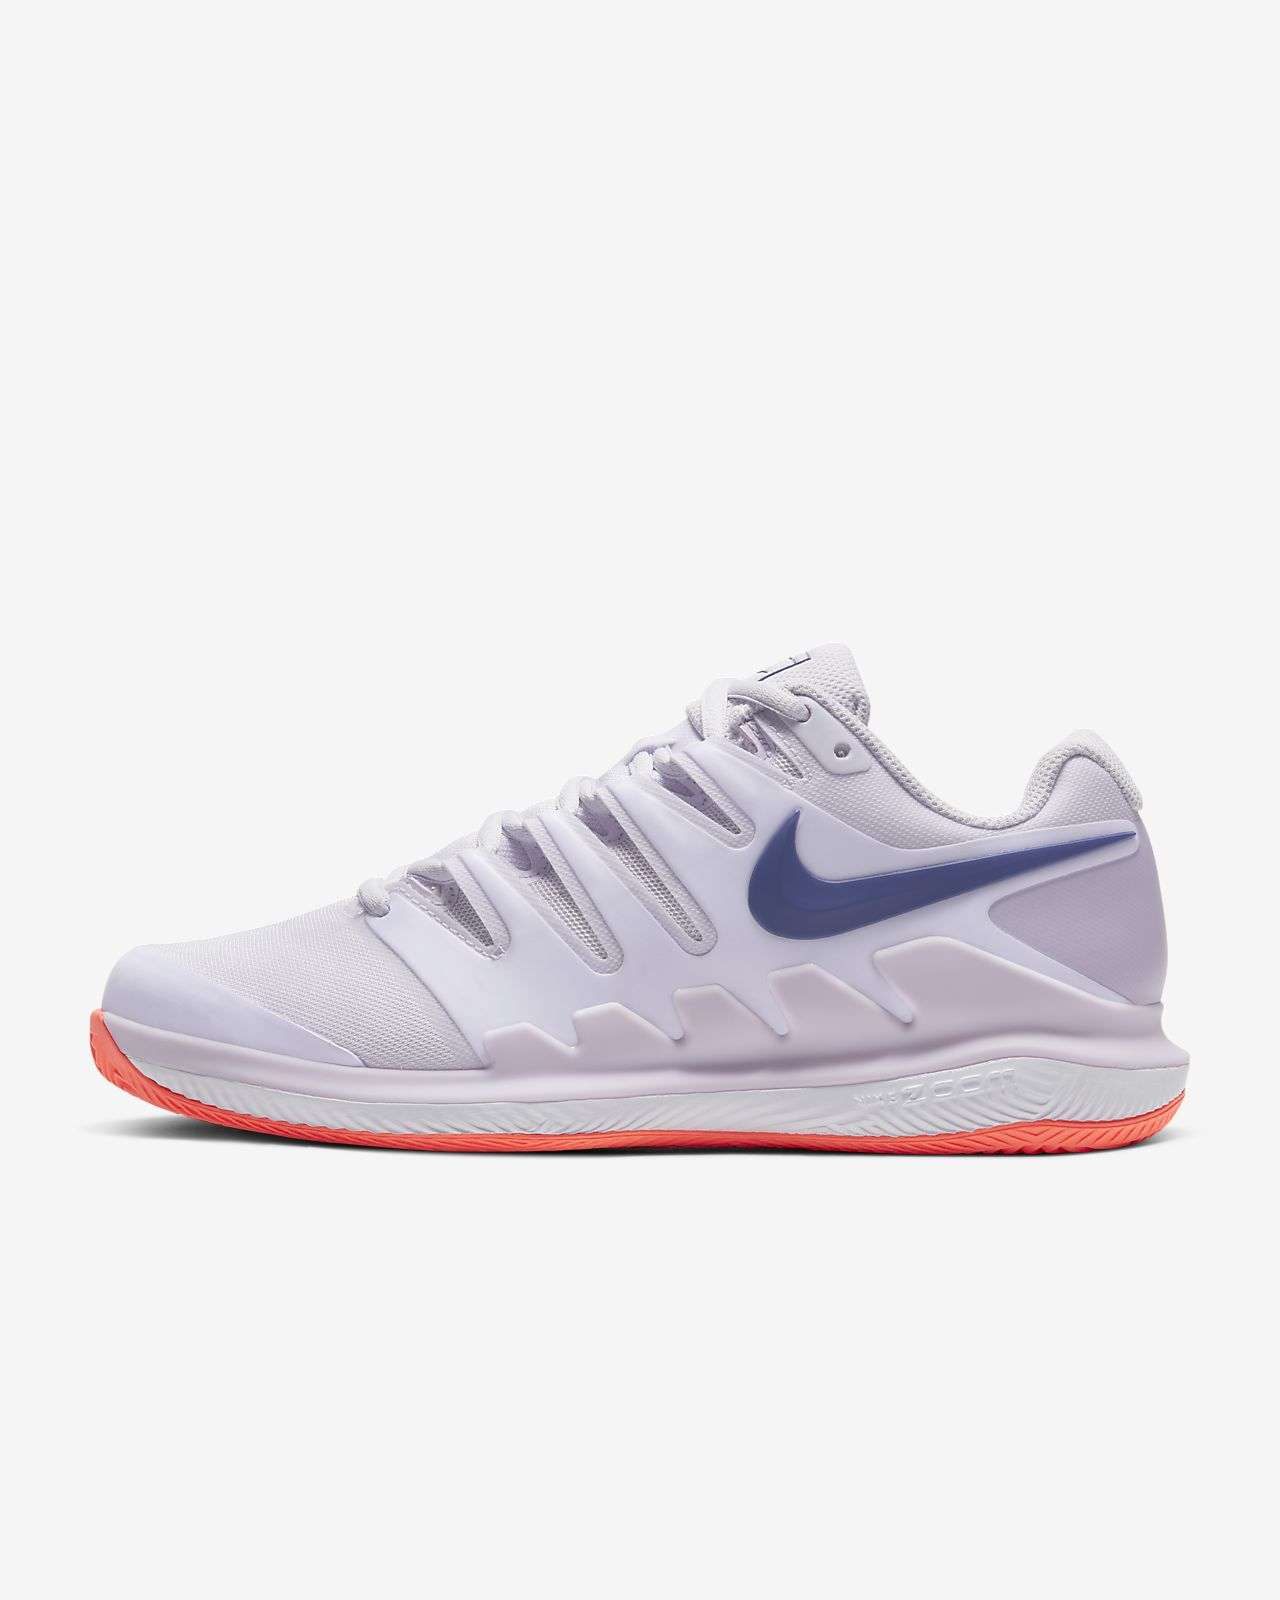 NikeCourt Air Zoom Vapor X Women's Clay